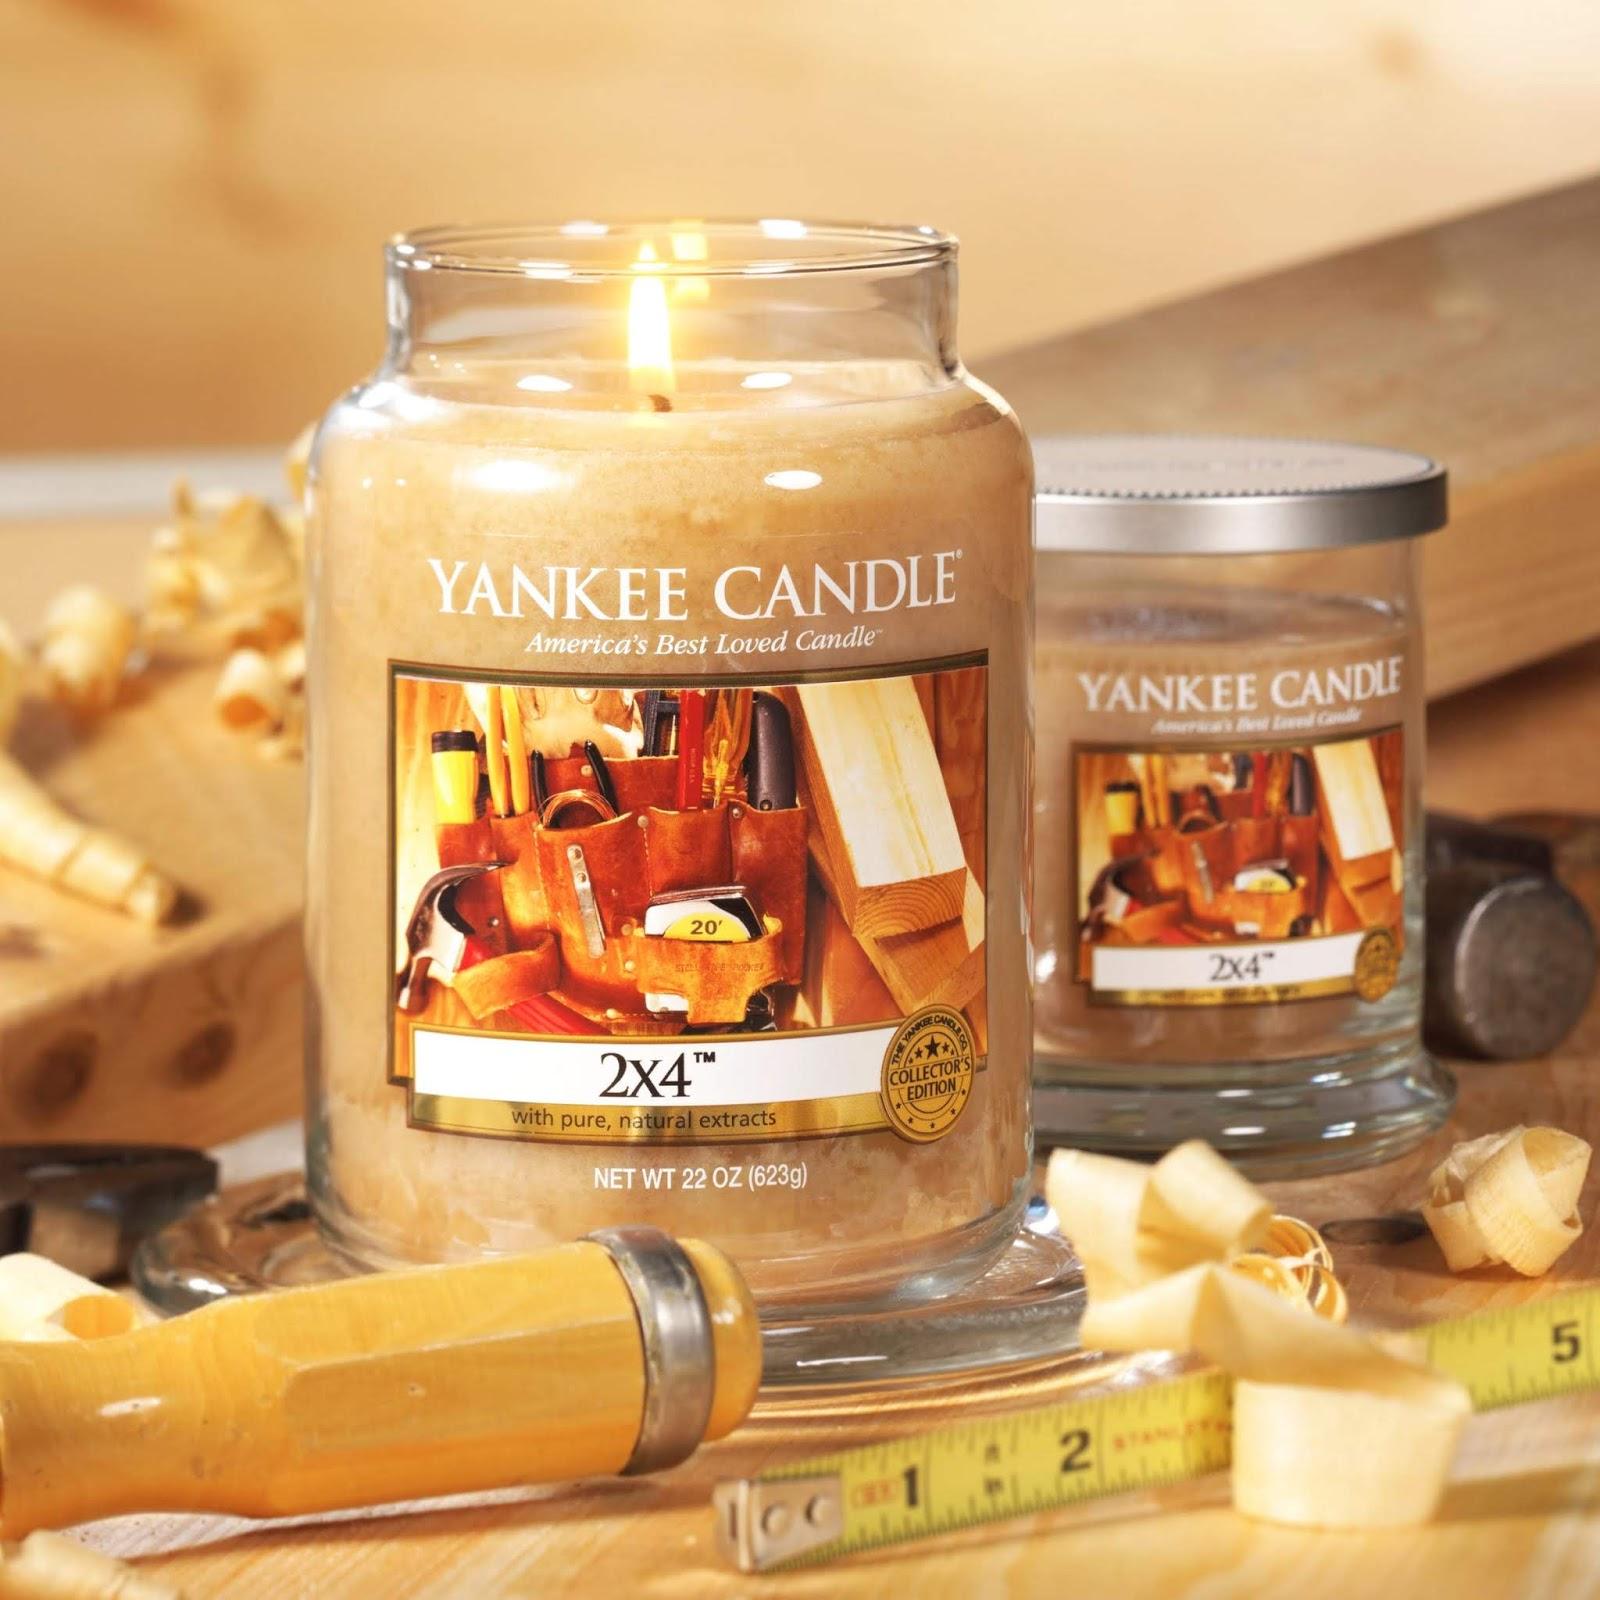 Yankee Candle 2×4